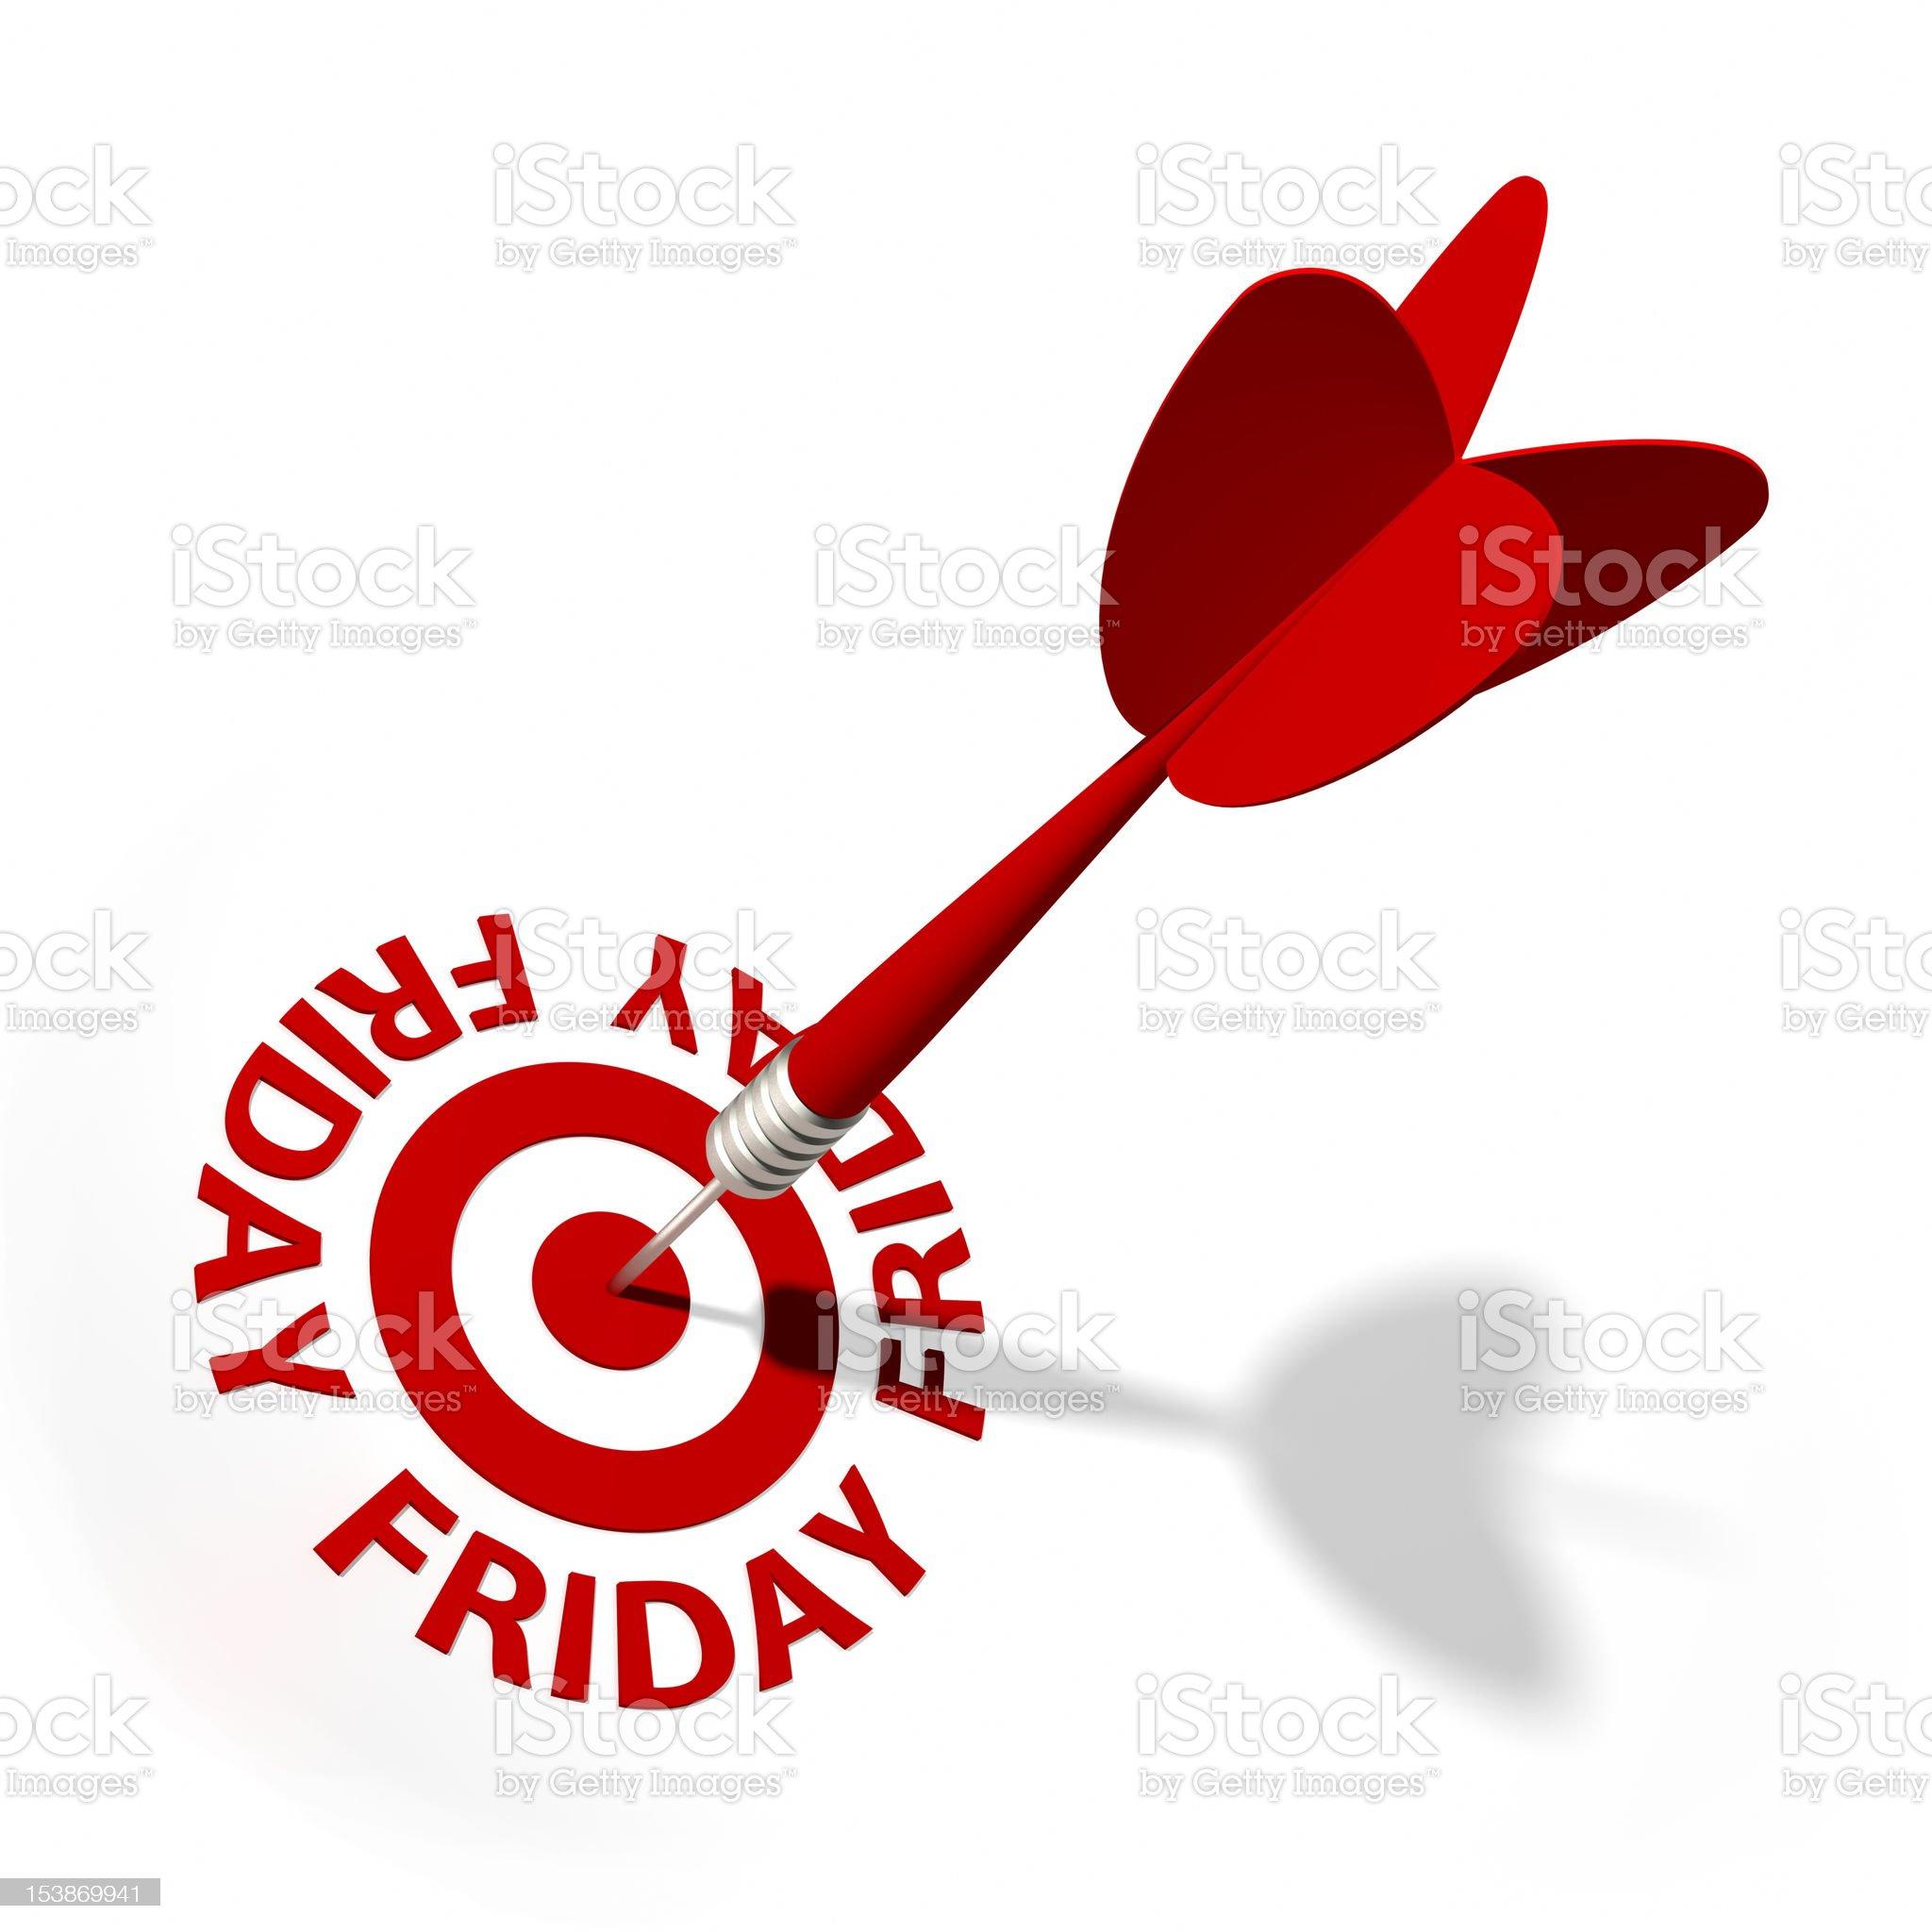 Friday Target royalty-free stock vector art